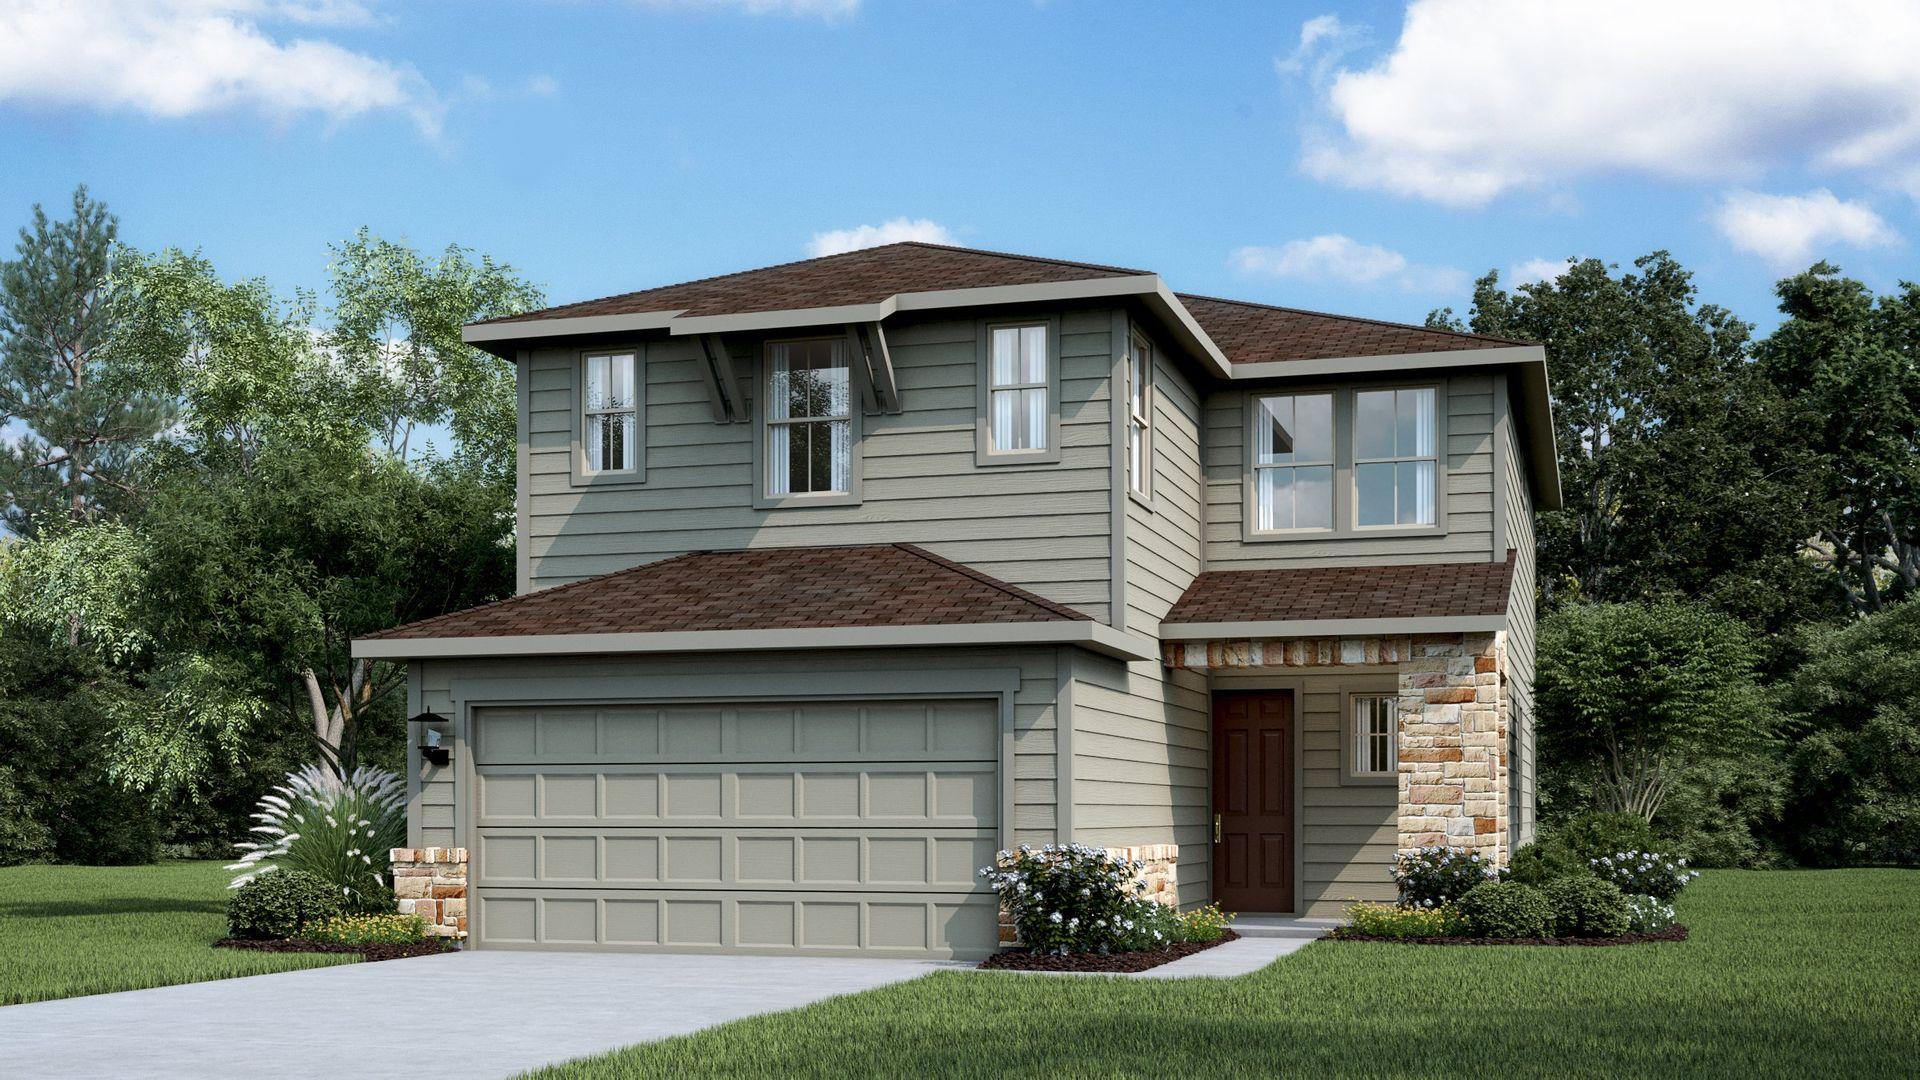 13521 Feldspar Drive (Montebello), Austin, Texas 78729  Montebello Plan